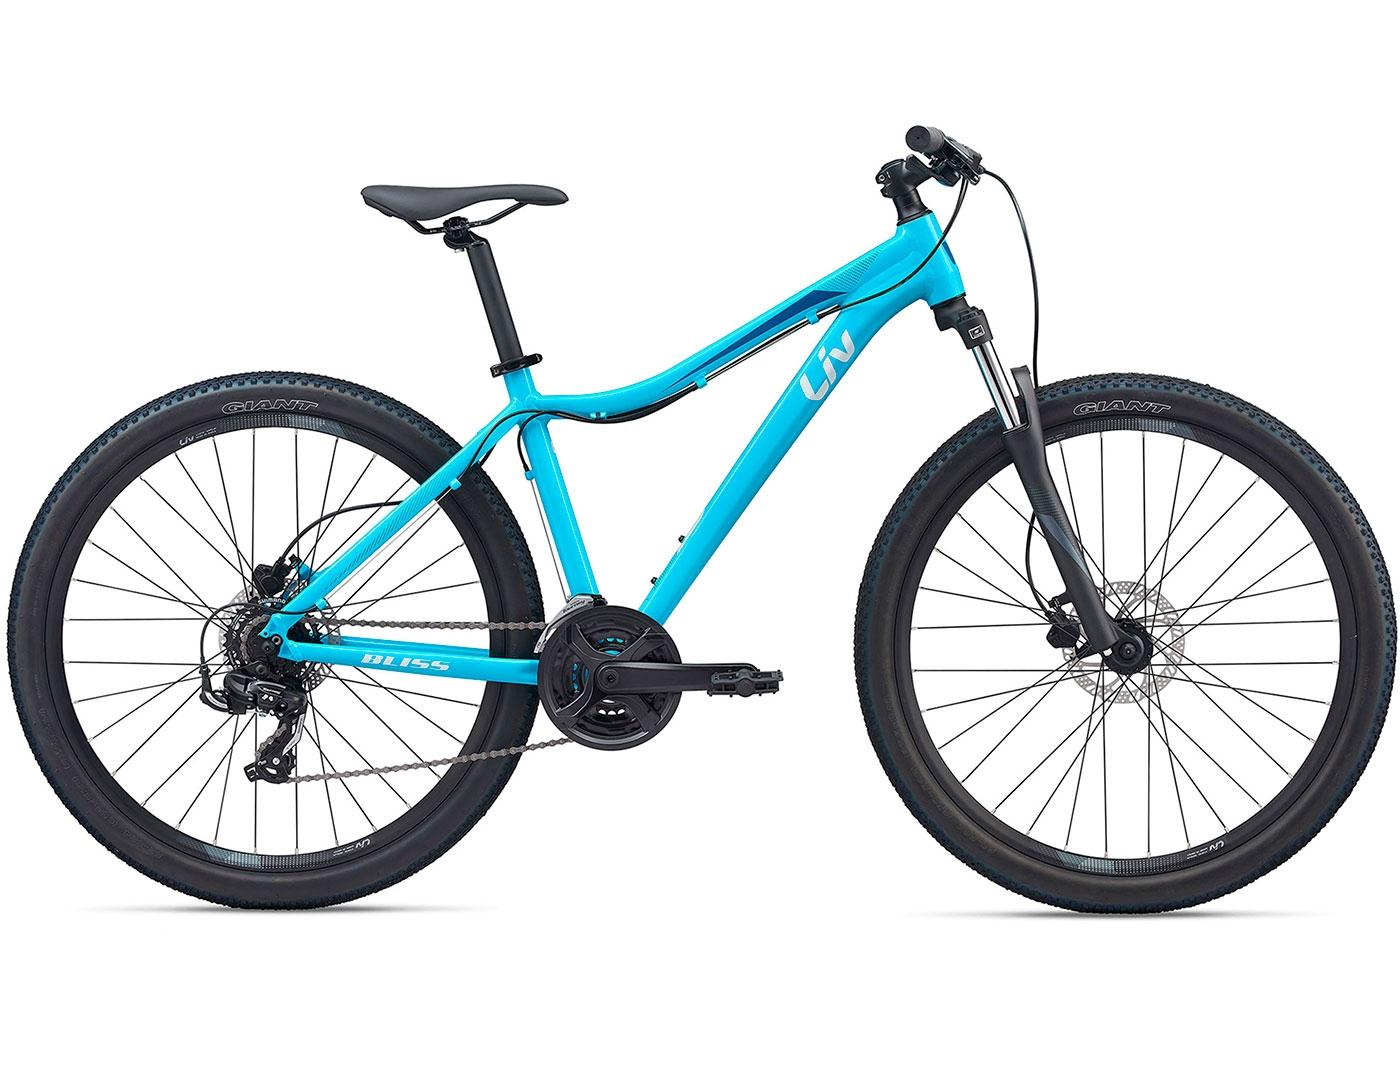 Велосипед Giant/Liv Bliss 2 27.5-GE (2020)